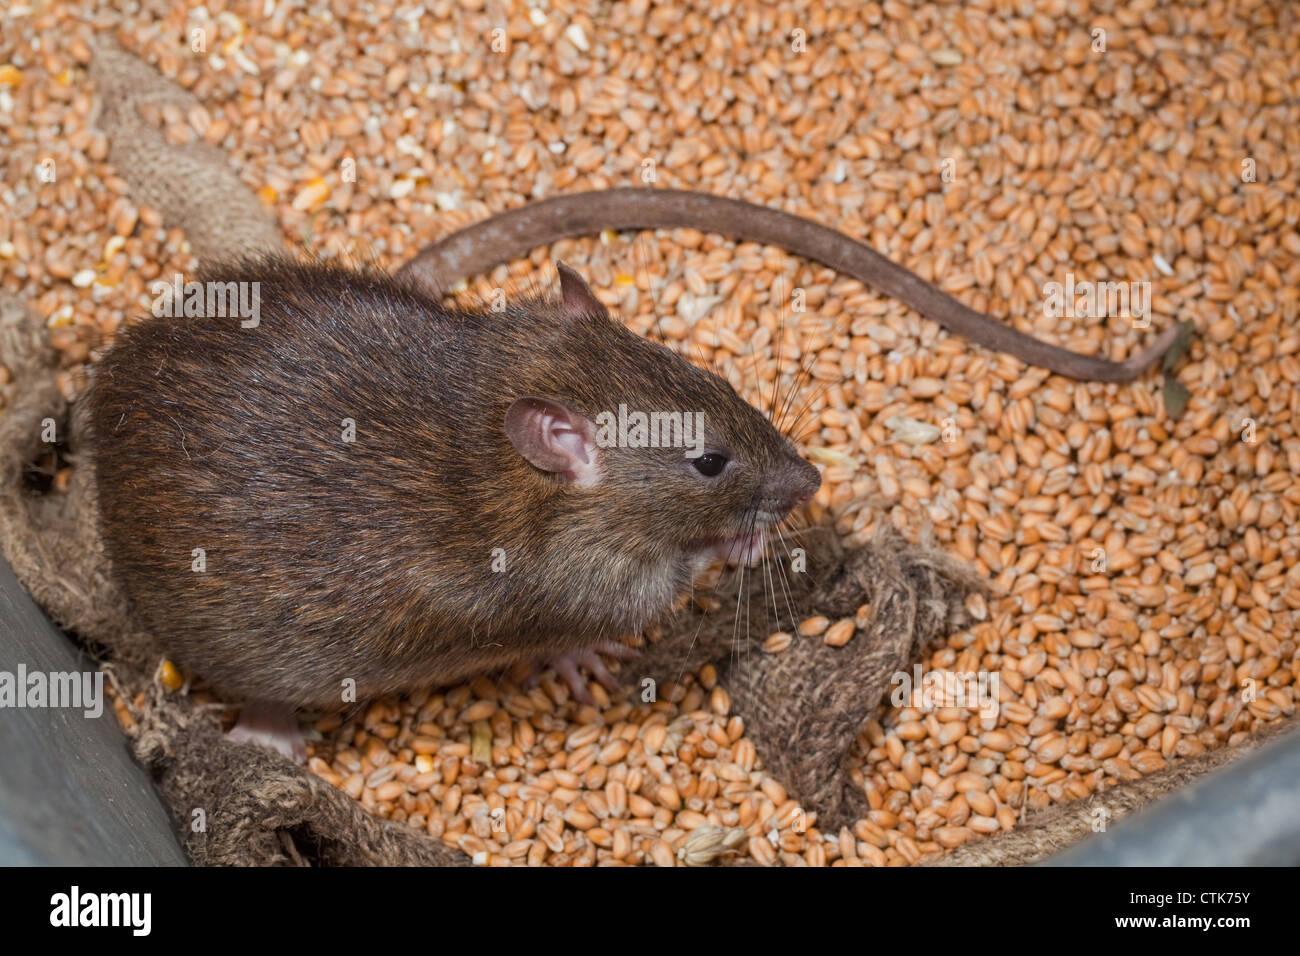 Brown Rat (Rattus norvegicus). Living amongst hessian bagged grain. - Stock Image